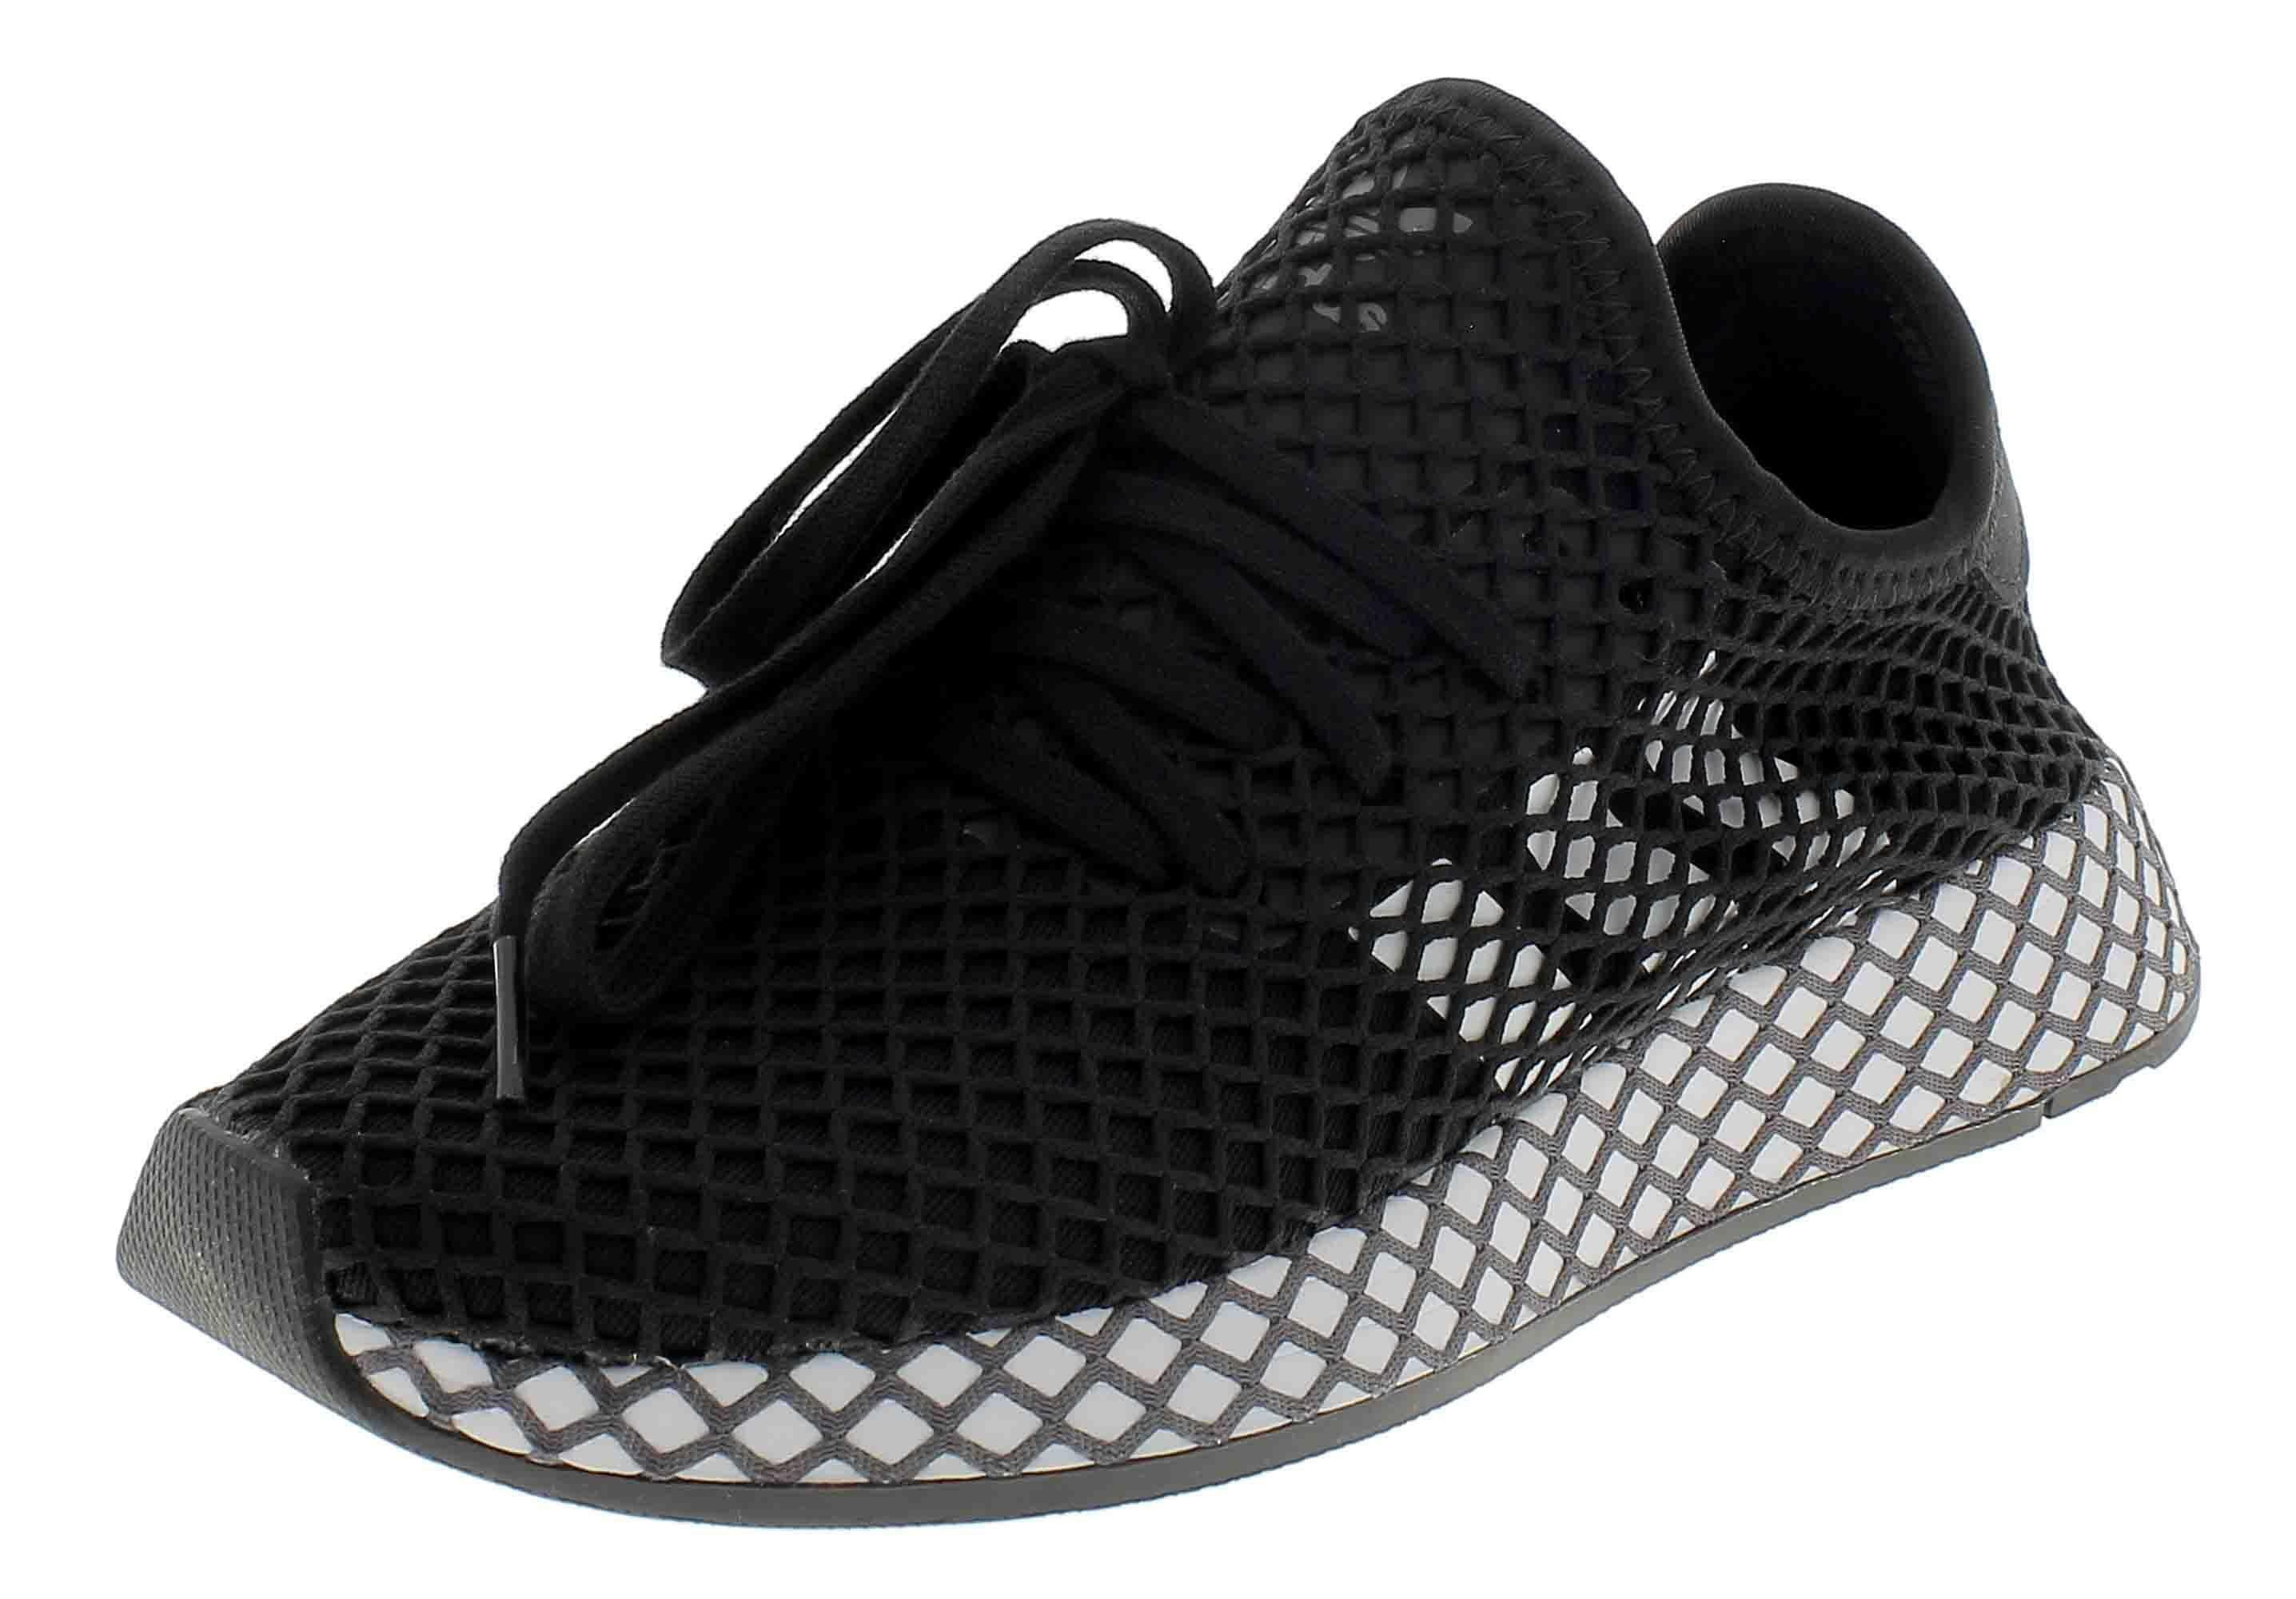 Nere Adidas Deerupt Scarpe Cg6840 Sportive Runner J Bambino pLSMVqUzG